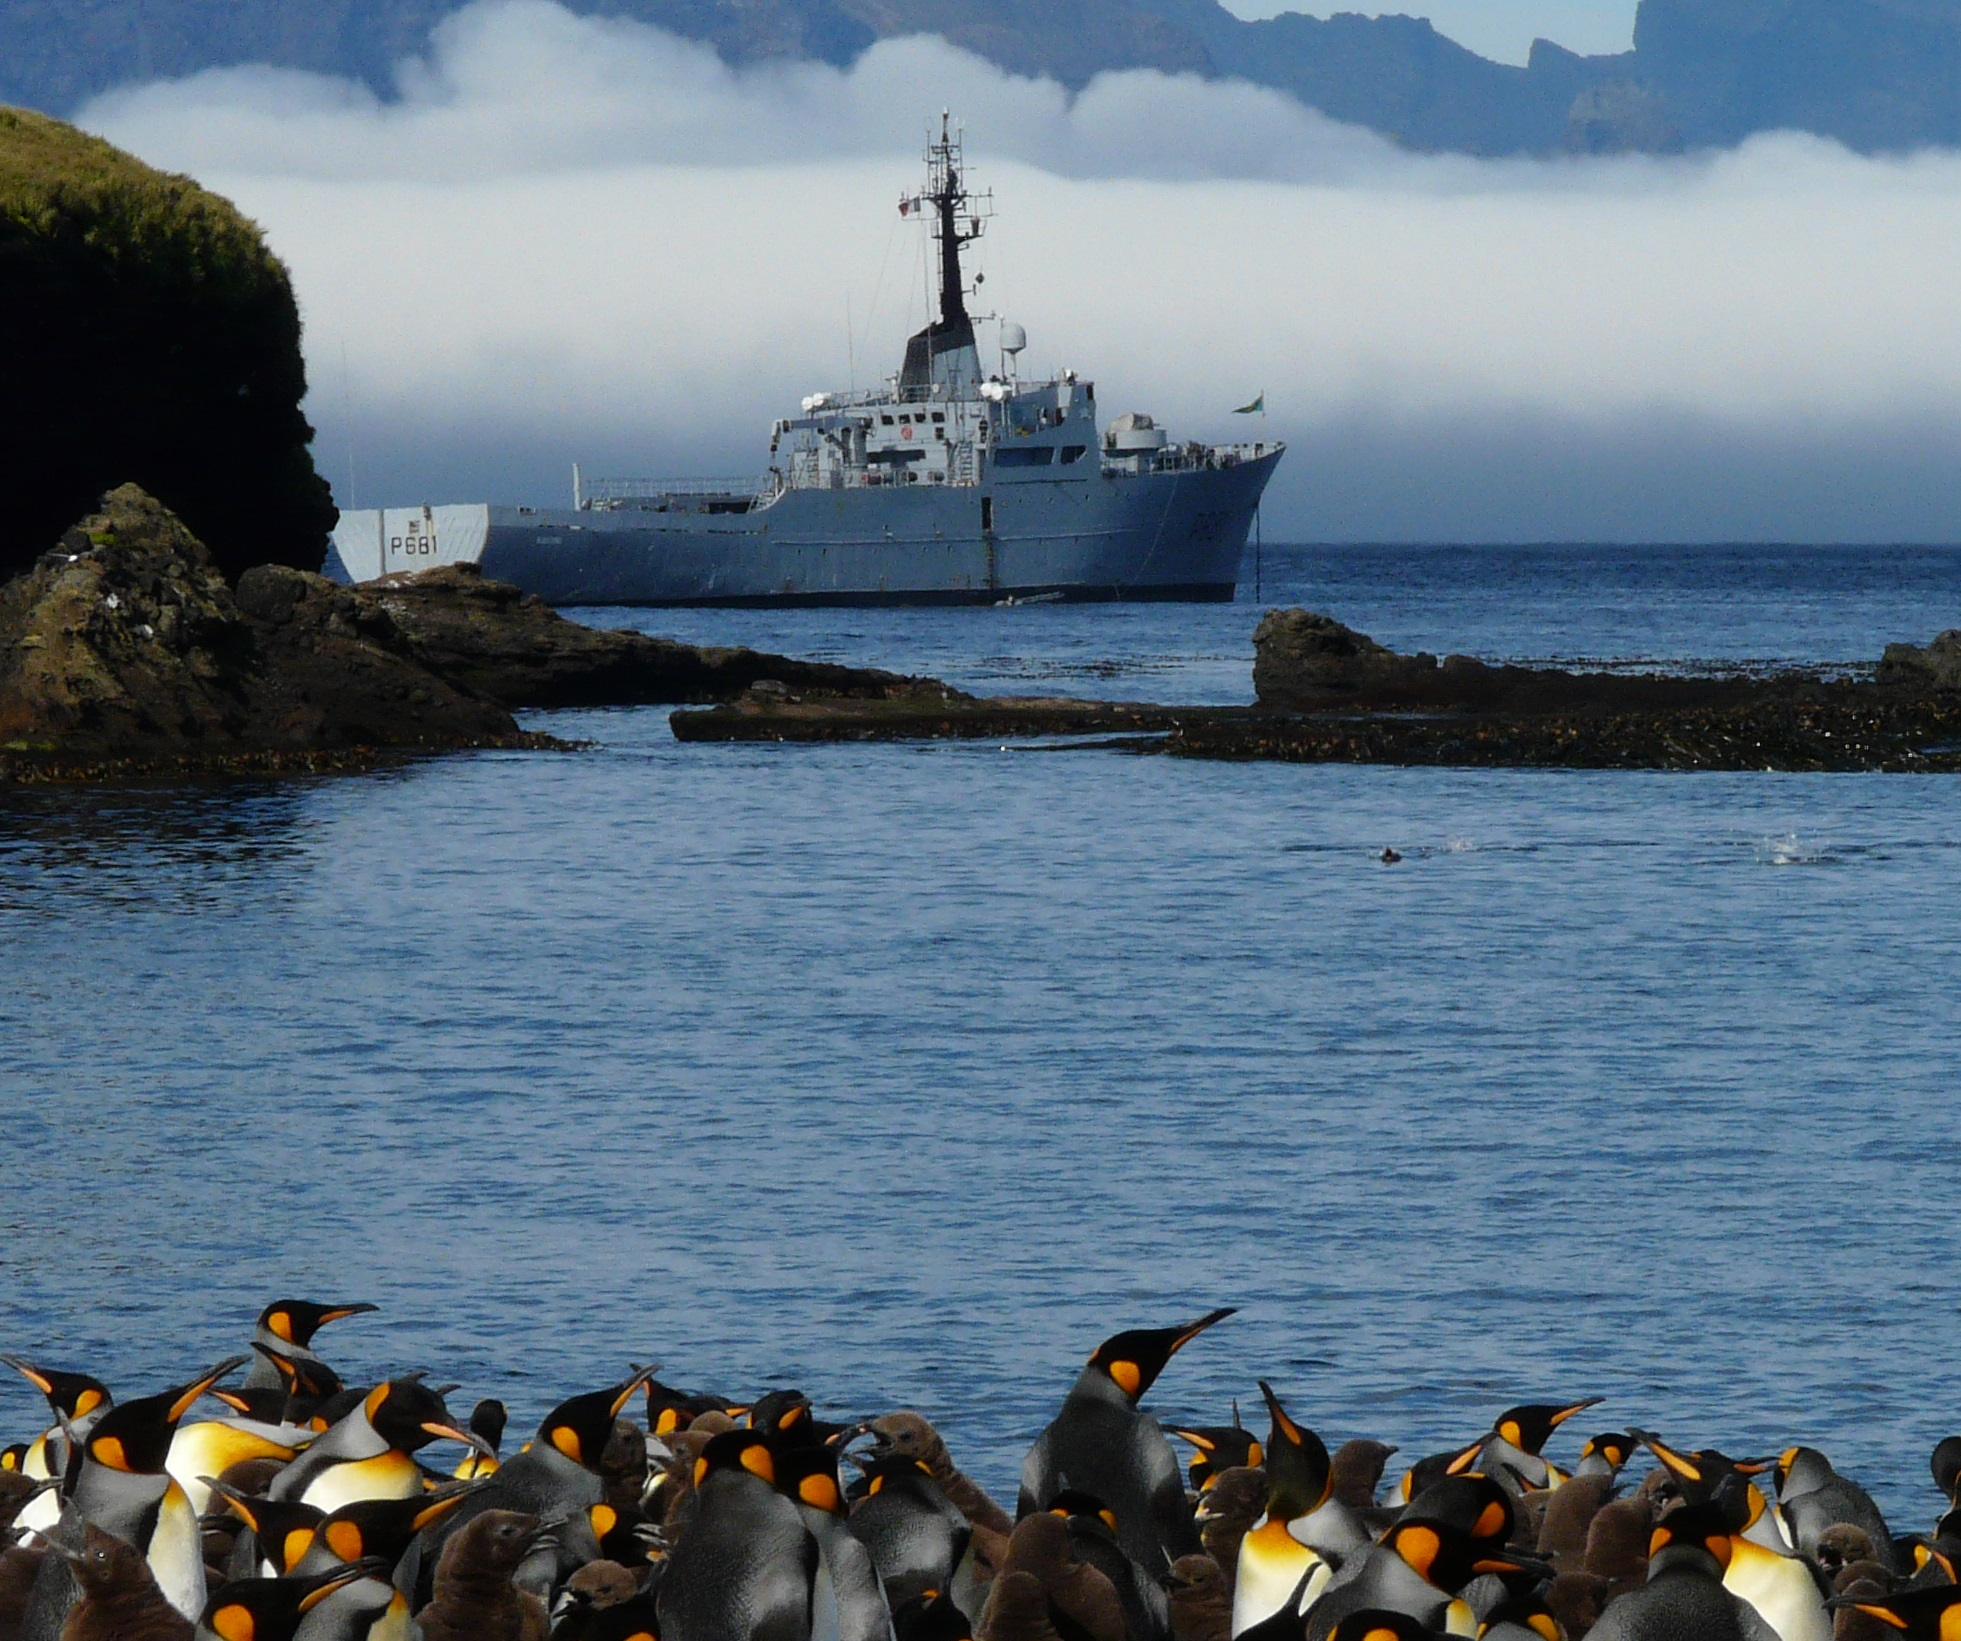 Patrouilleur_austral_Albatros_(mars_2013)_-_panoramio_DETAIL